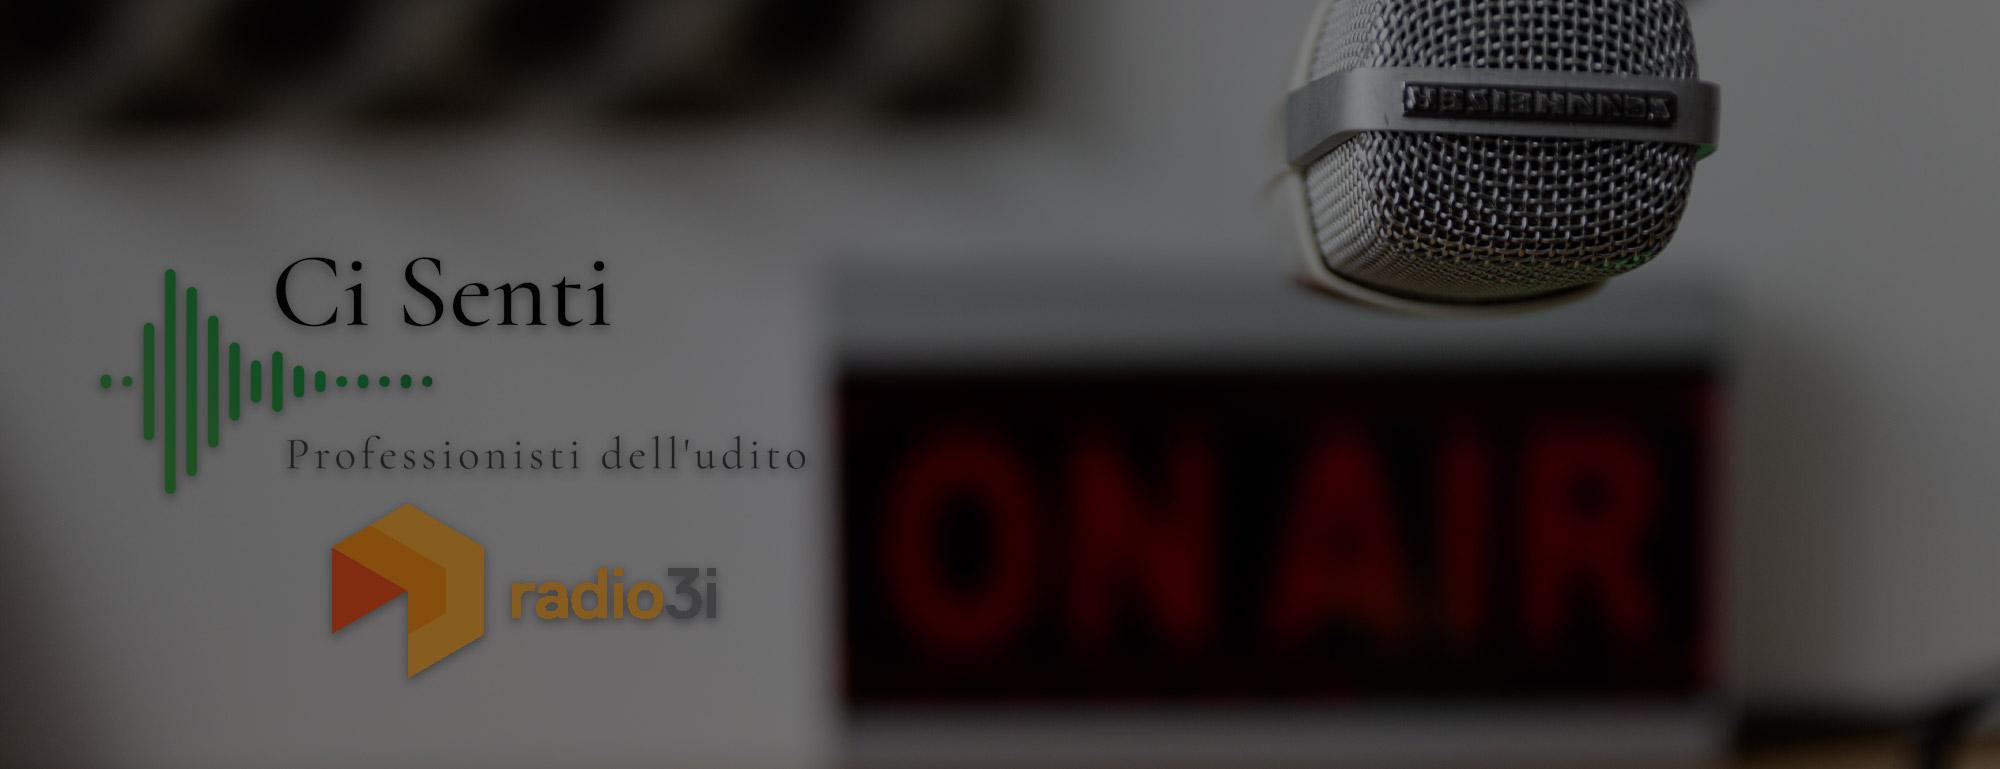 Spot Ci Senti su Radio 3i